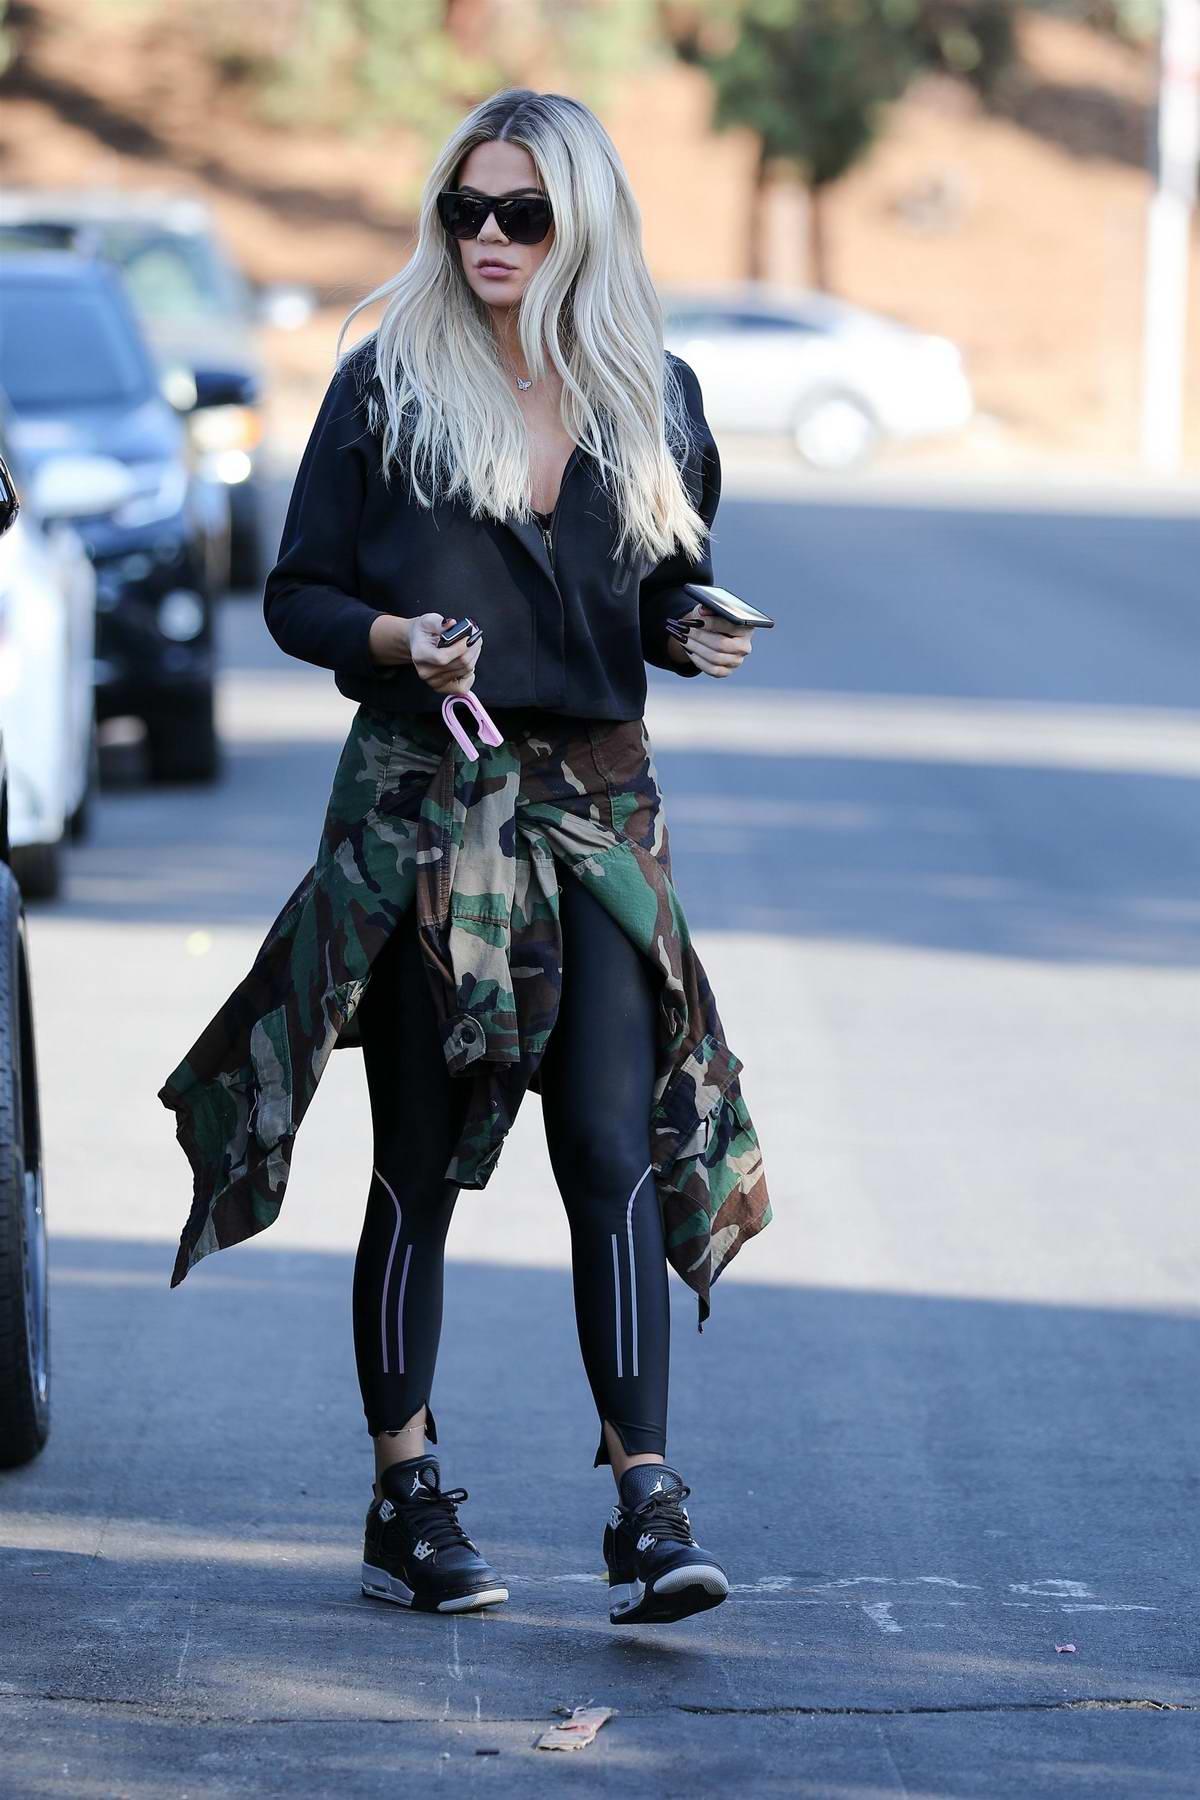 Khloe Kardashian keeps things casual in black activewear while visiting a friend in Van Nuys, California